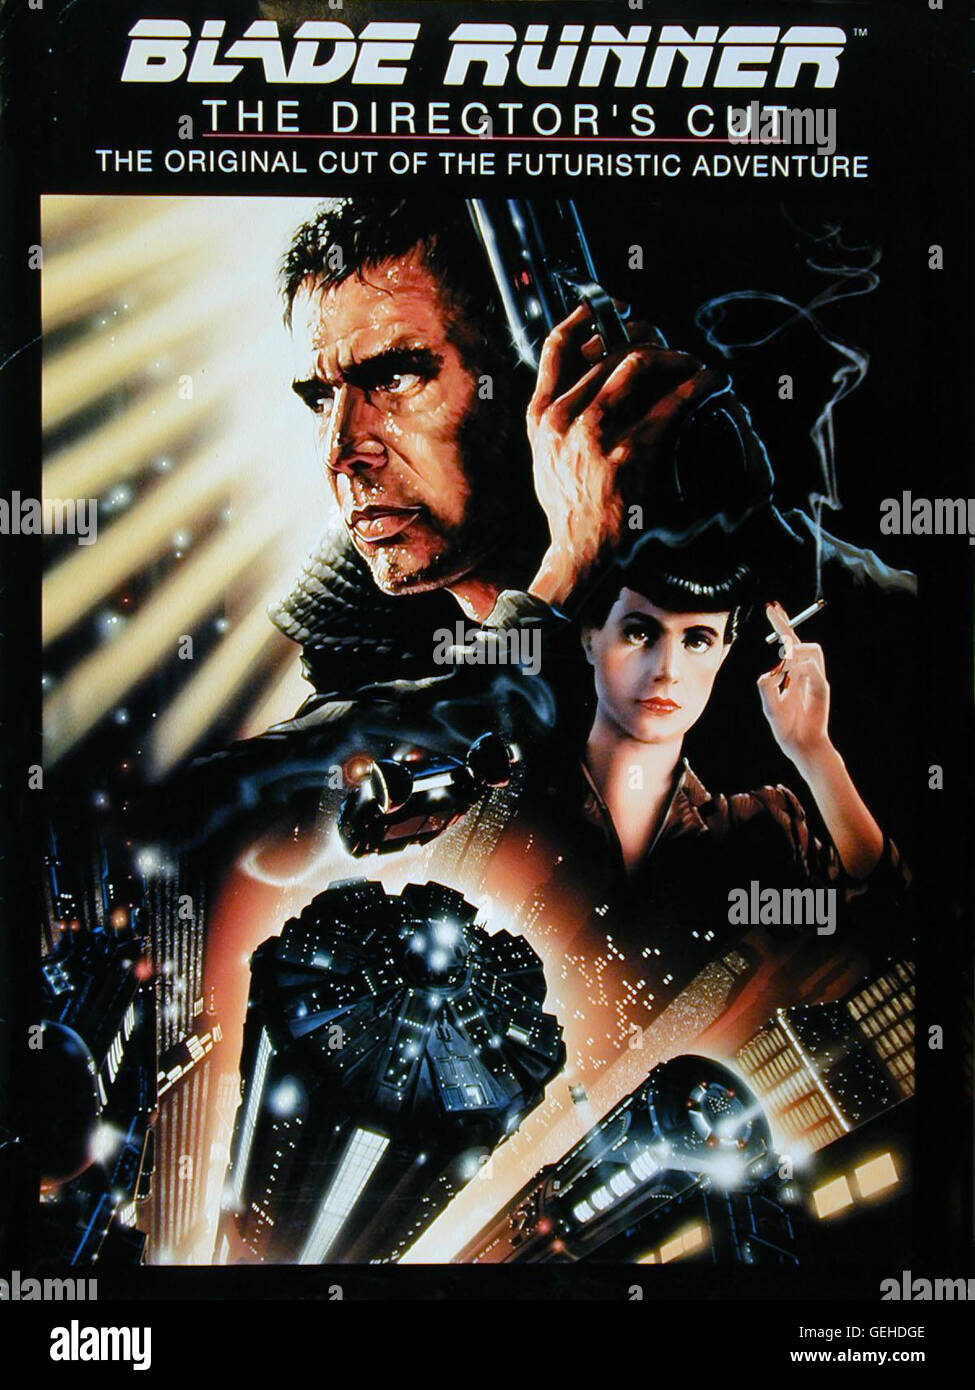 Poster *** Local Caption *** 1982, Blade Runner, Der Blade Runner - Poster - - Stock Image